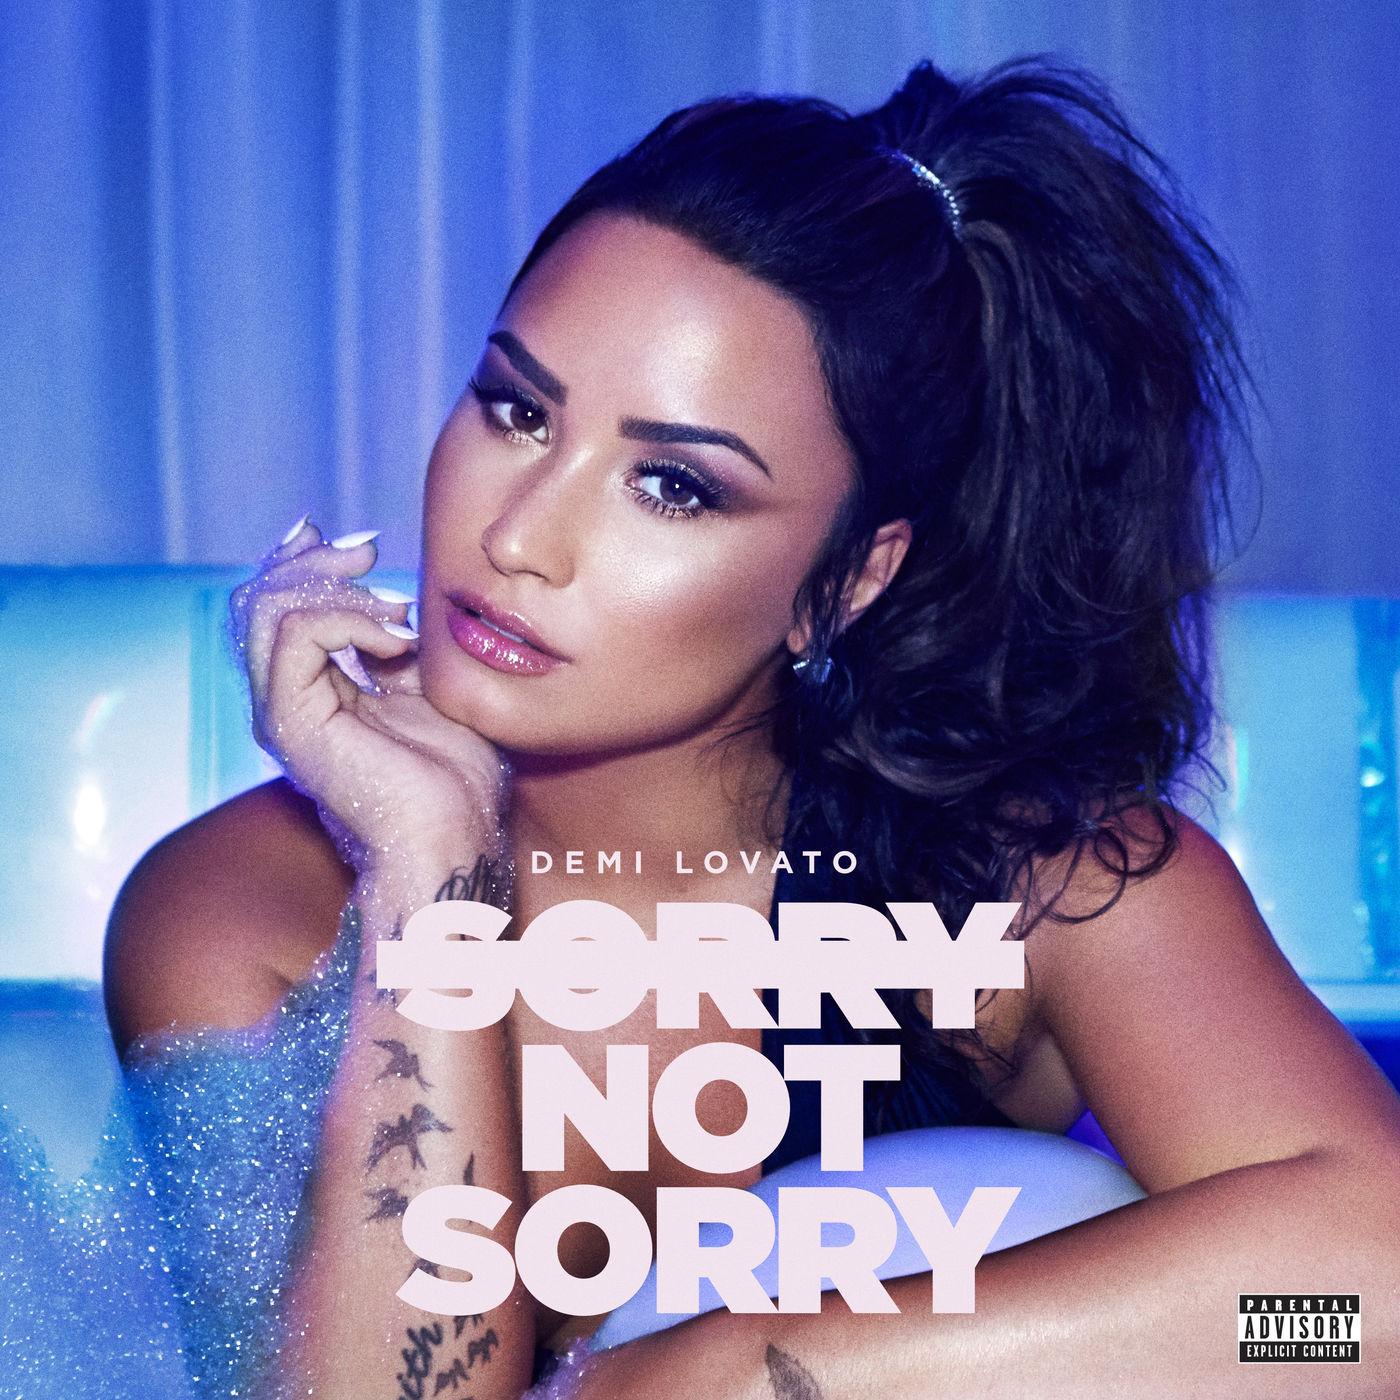 Demi+Lovato+-+Sorry+Not+Sorry.jpg